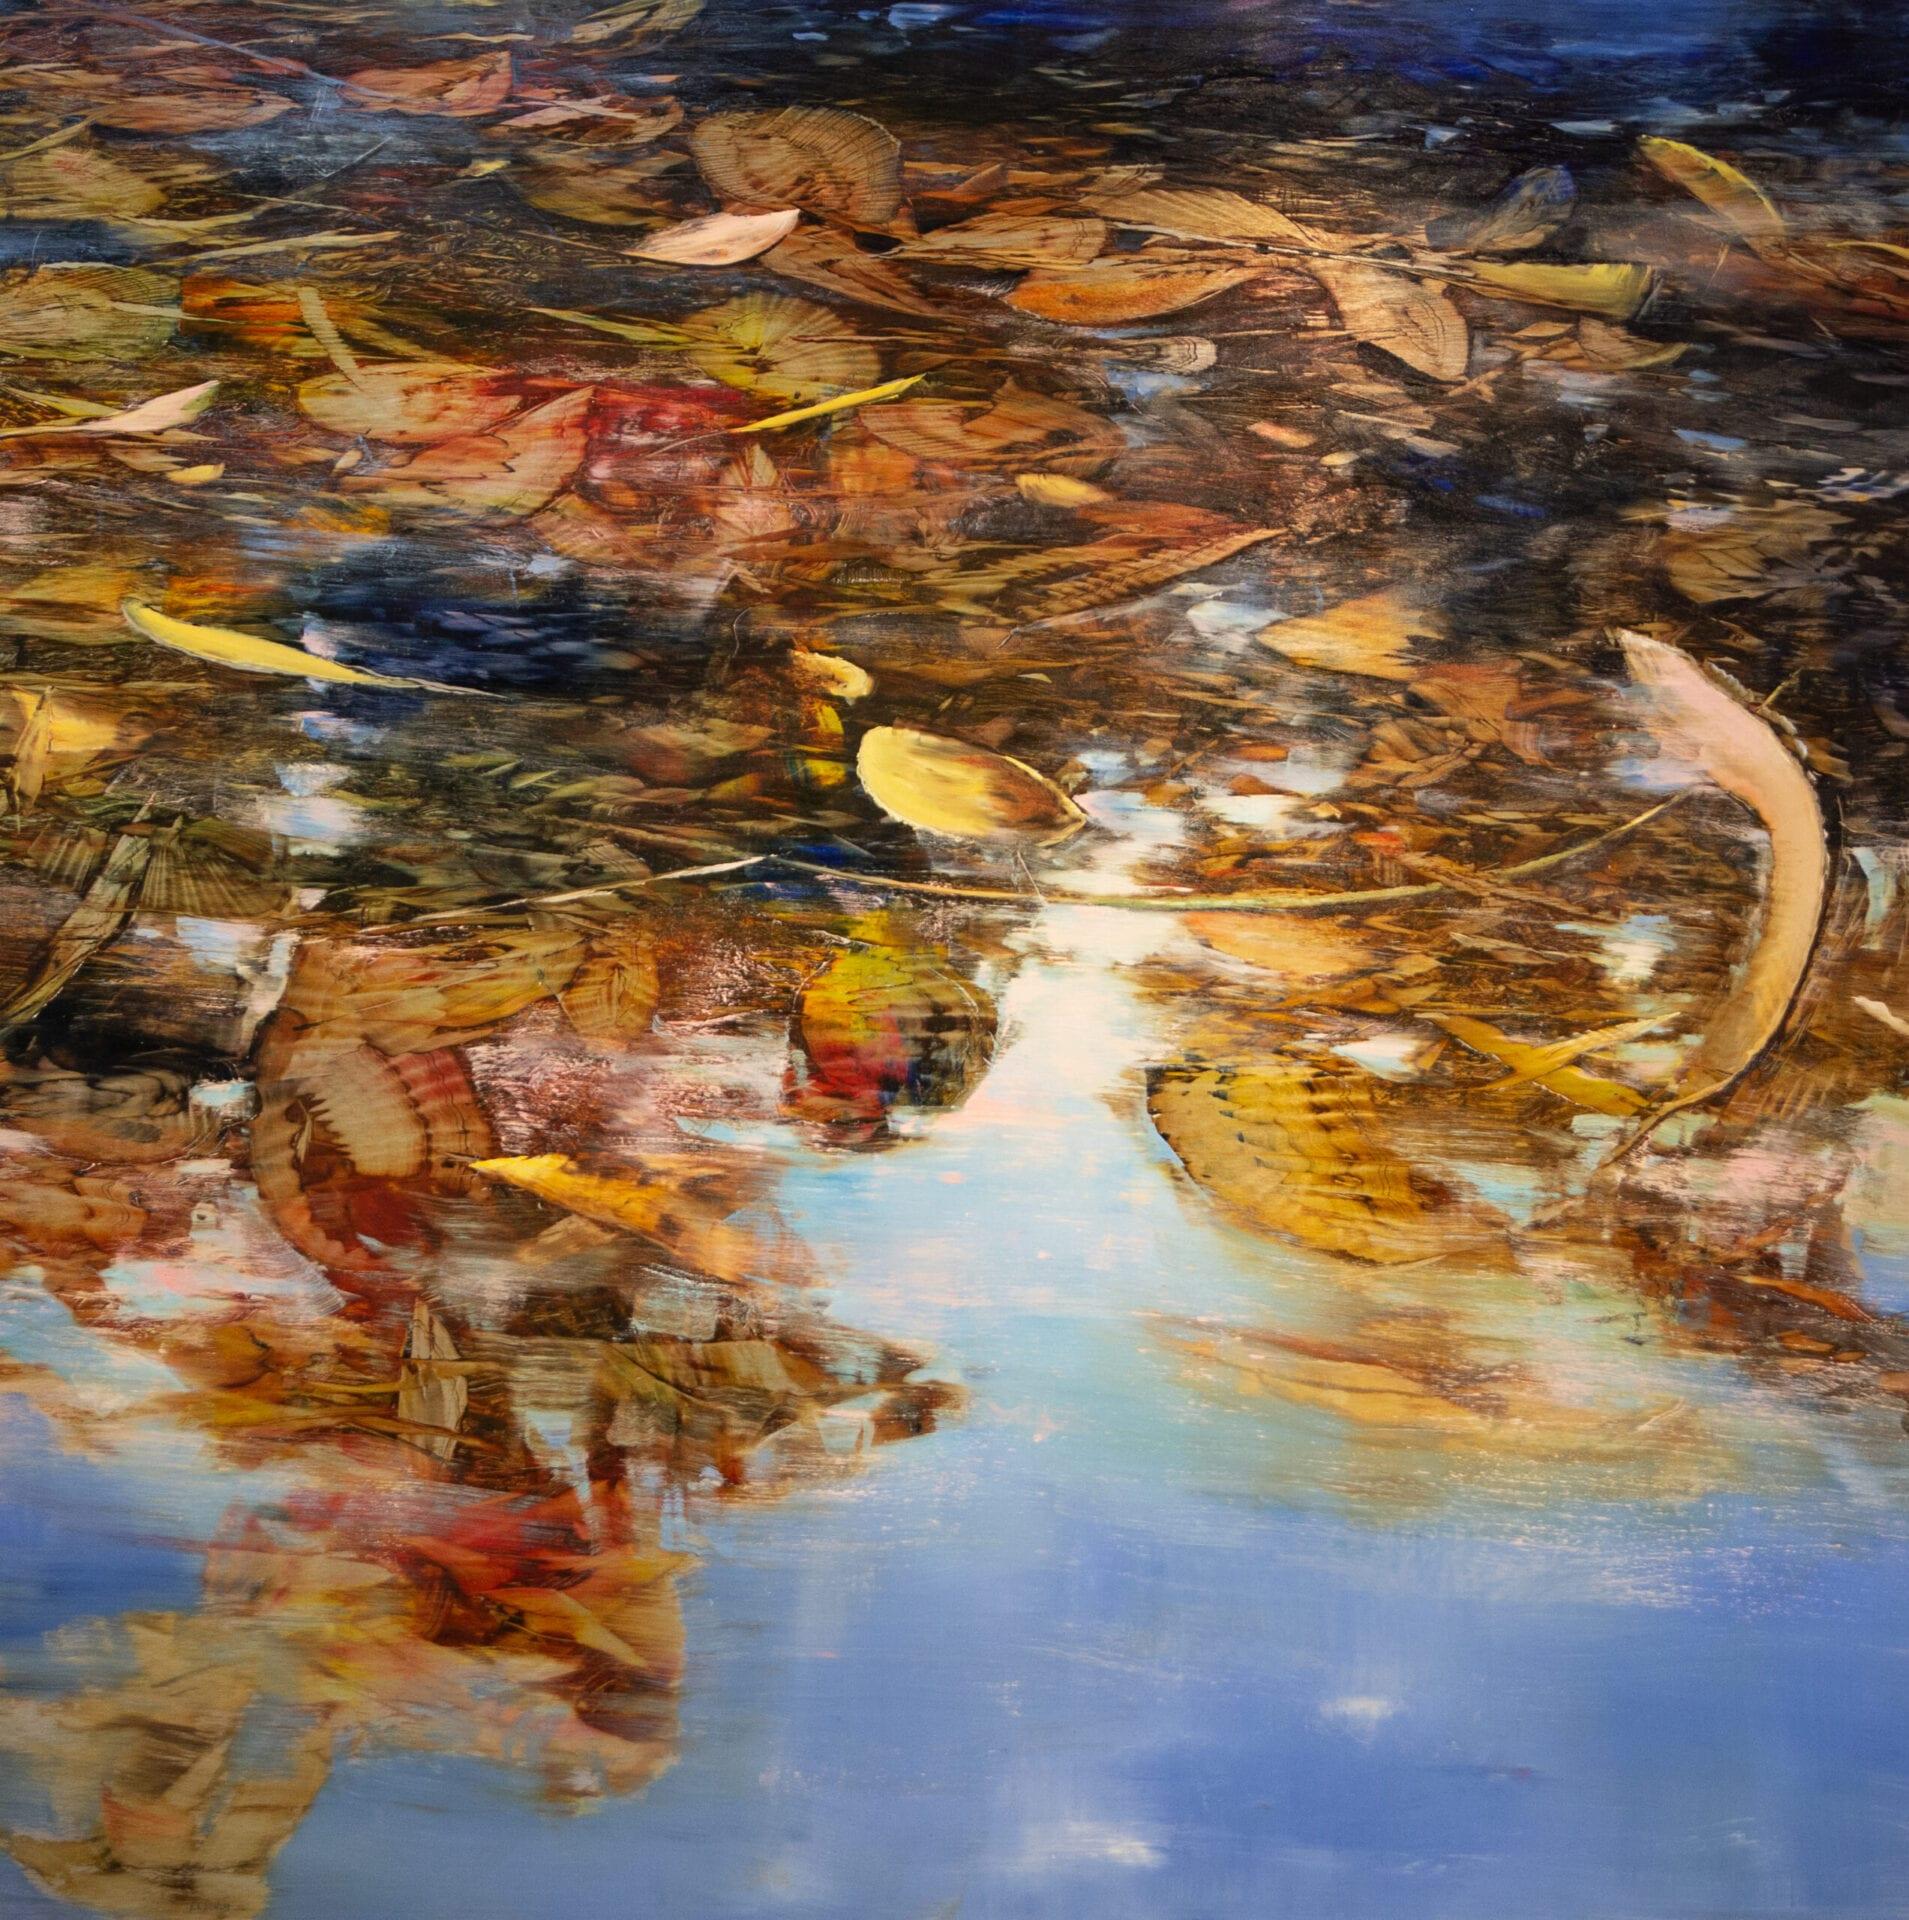 David Dunlop - Leaves in Water